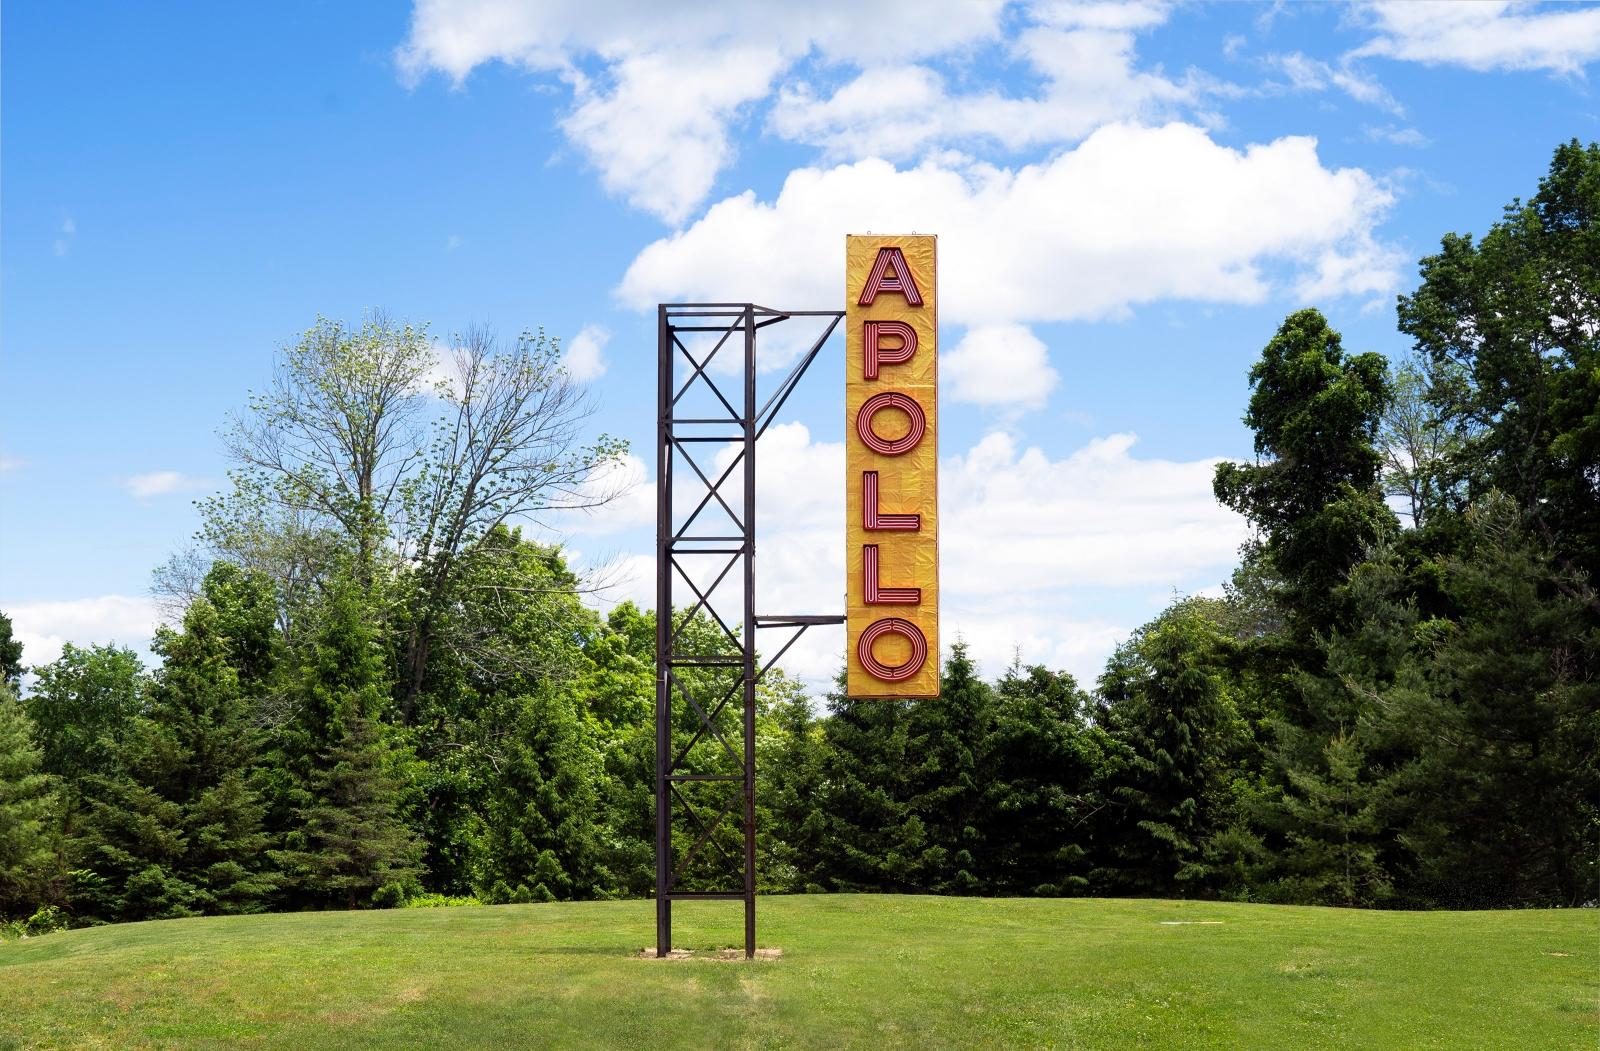 NARI WARD, Apollo / Poll, 2017